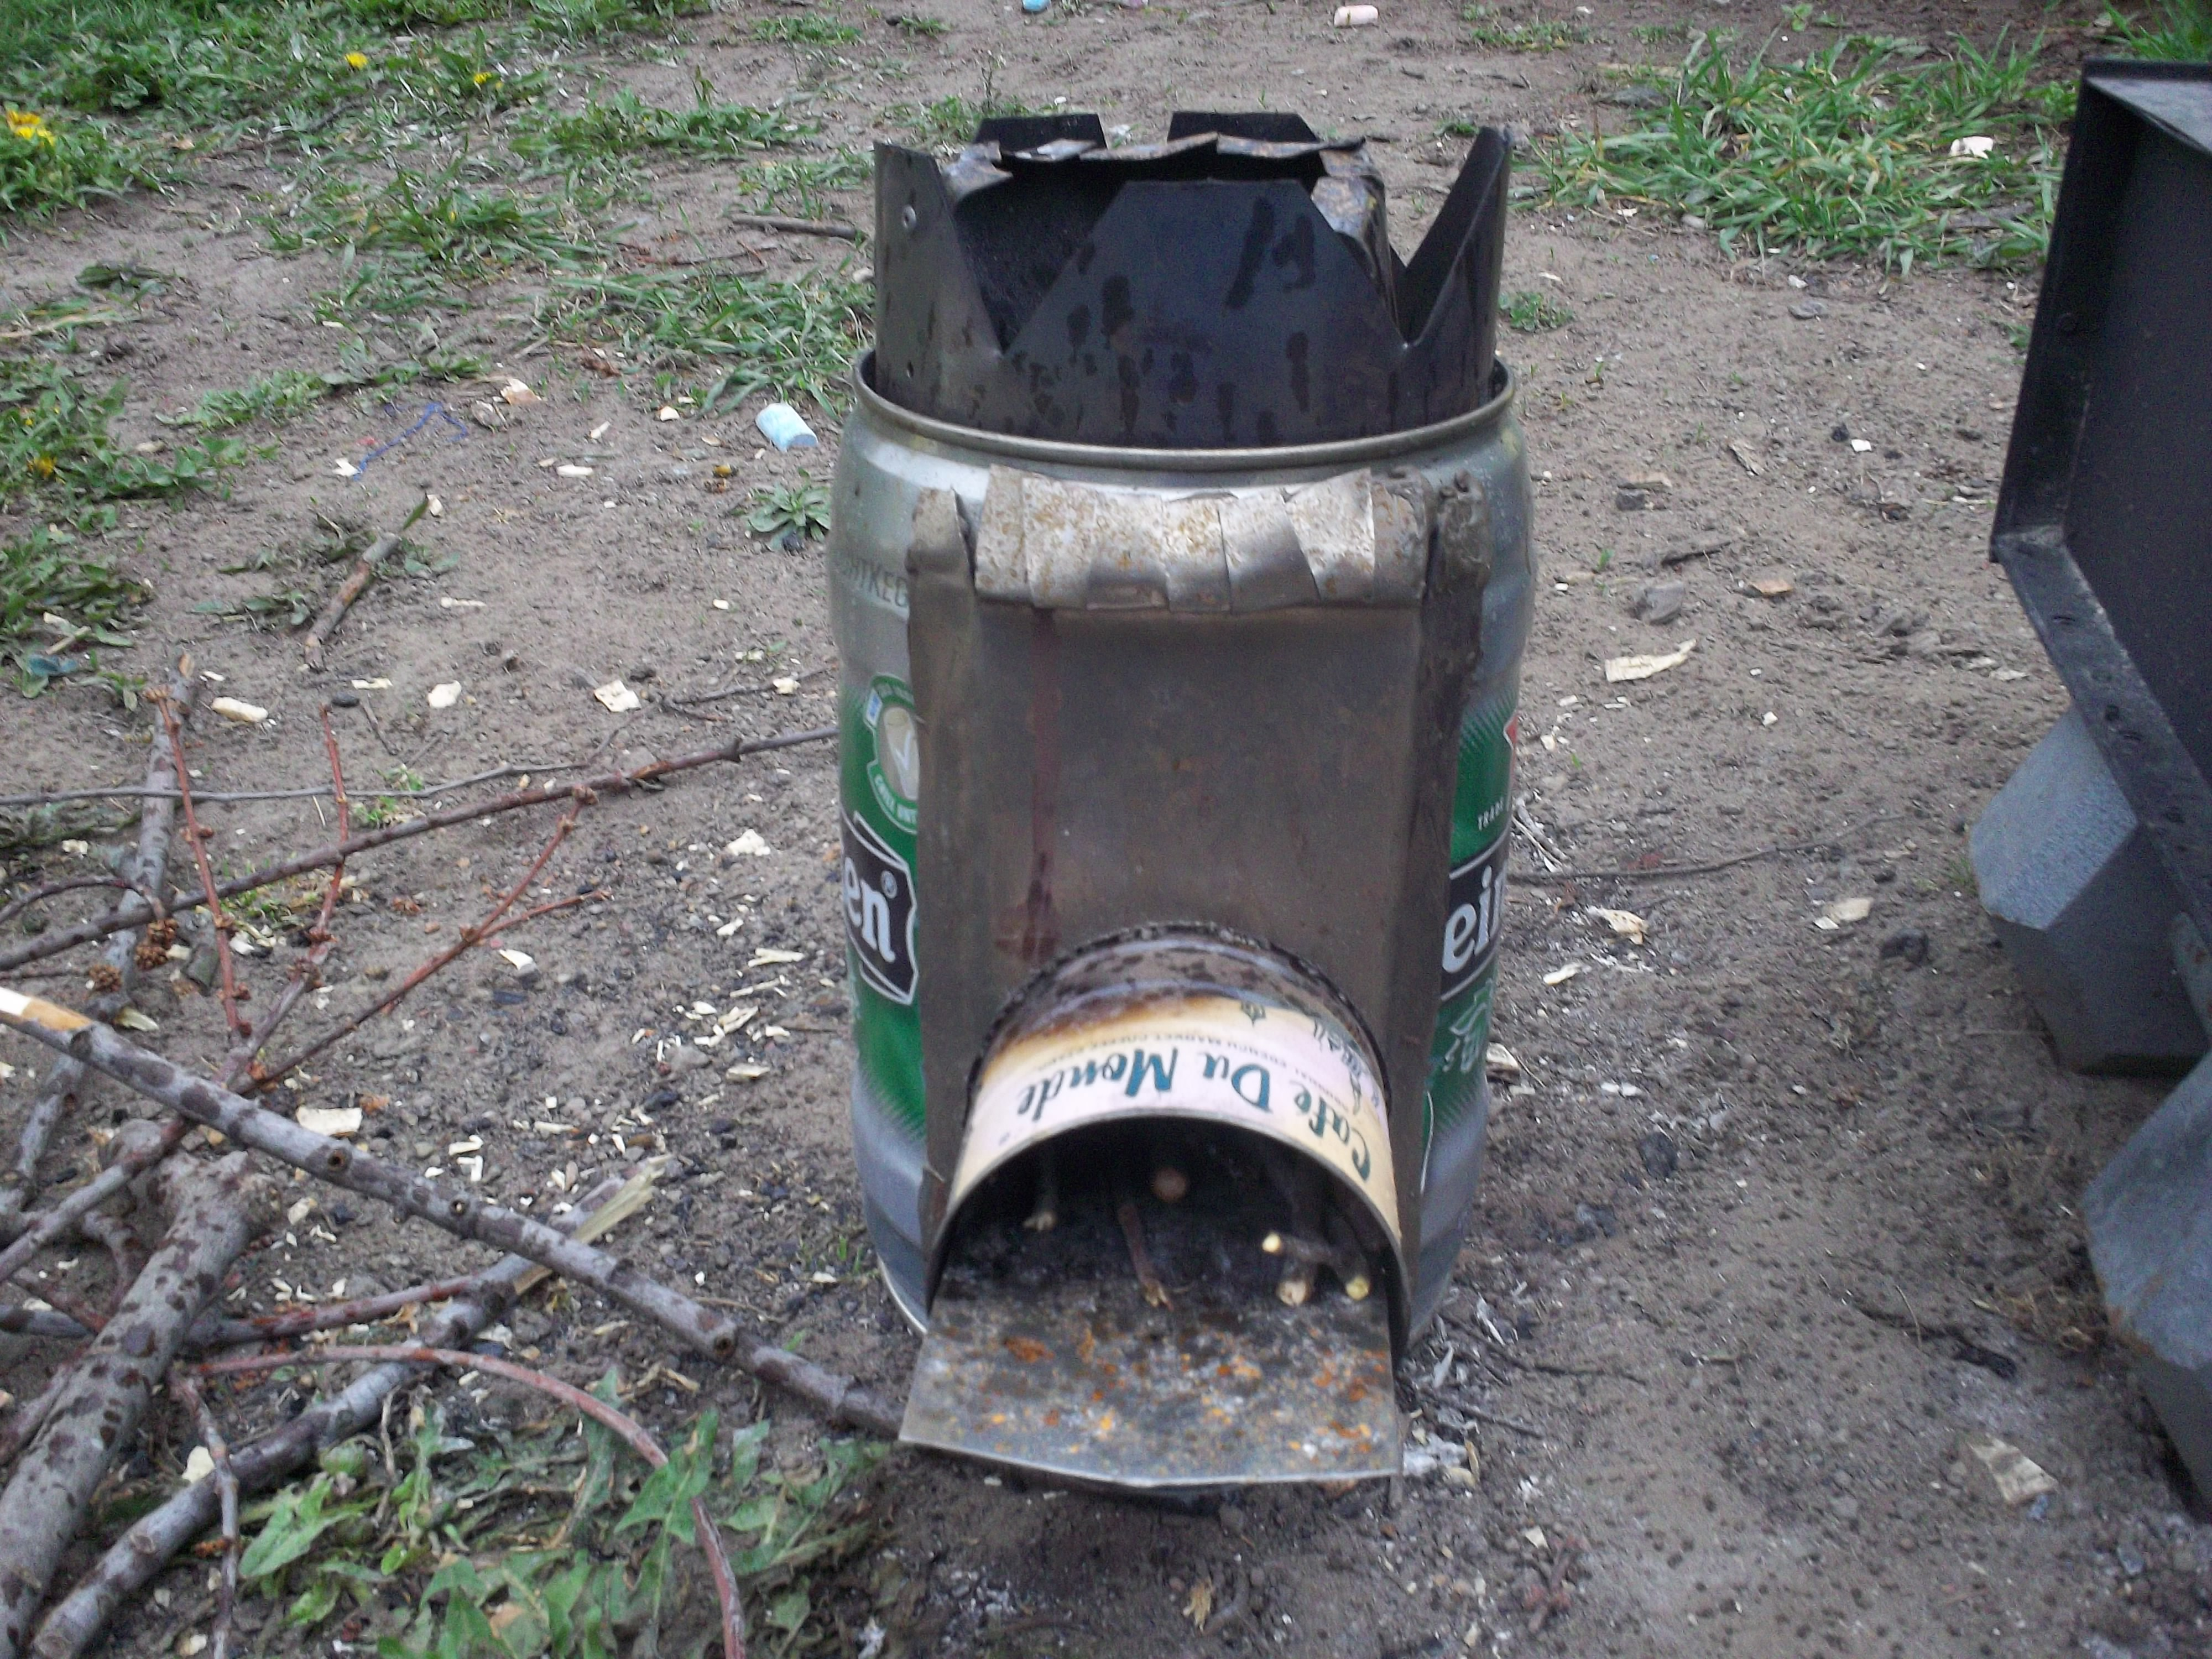 Diy wood stove nagginginspiration for Jet stove diy